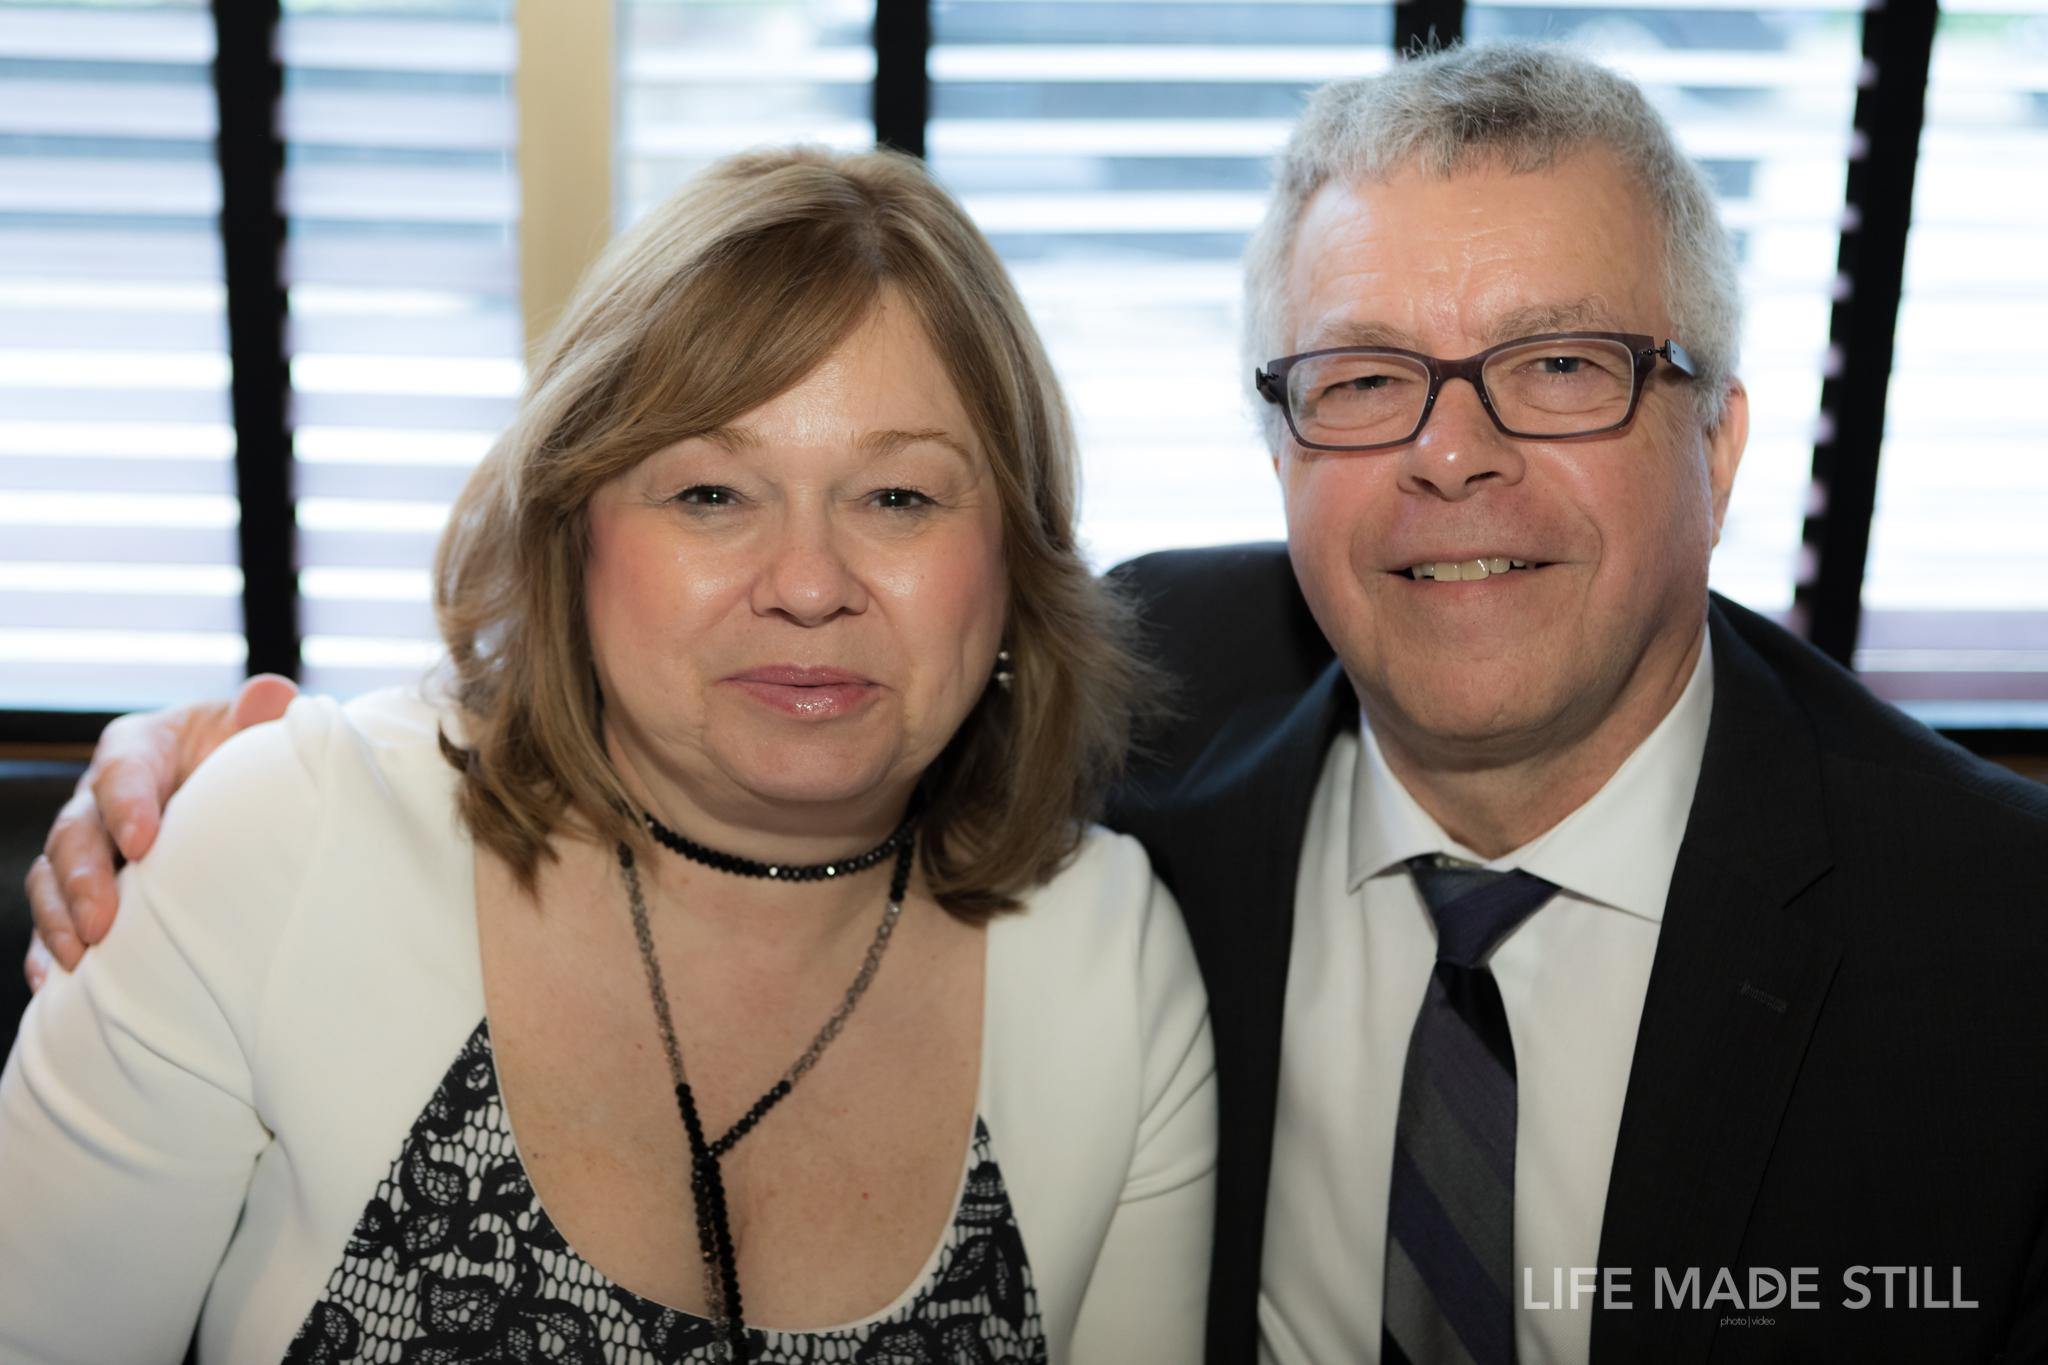 410_633_Angela and Tony_2048px_lifemadestill.com.jpg